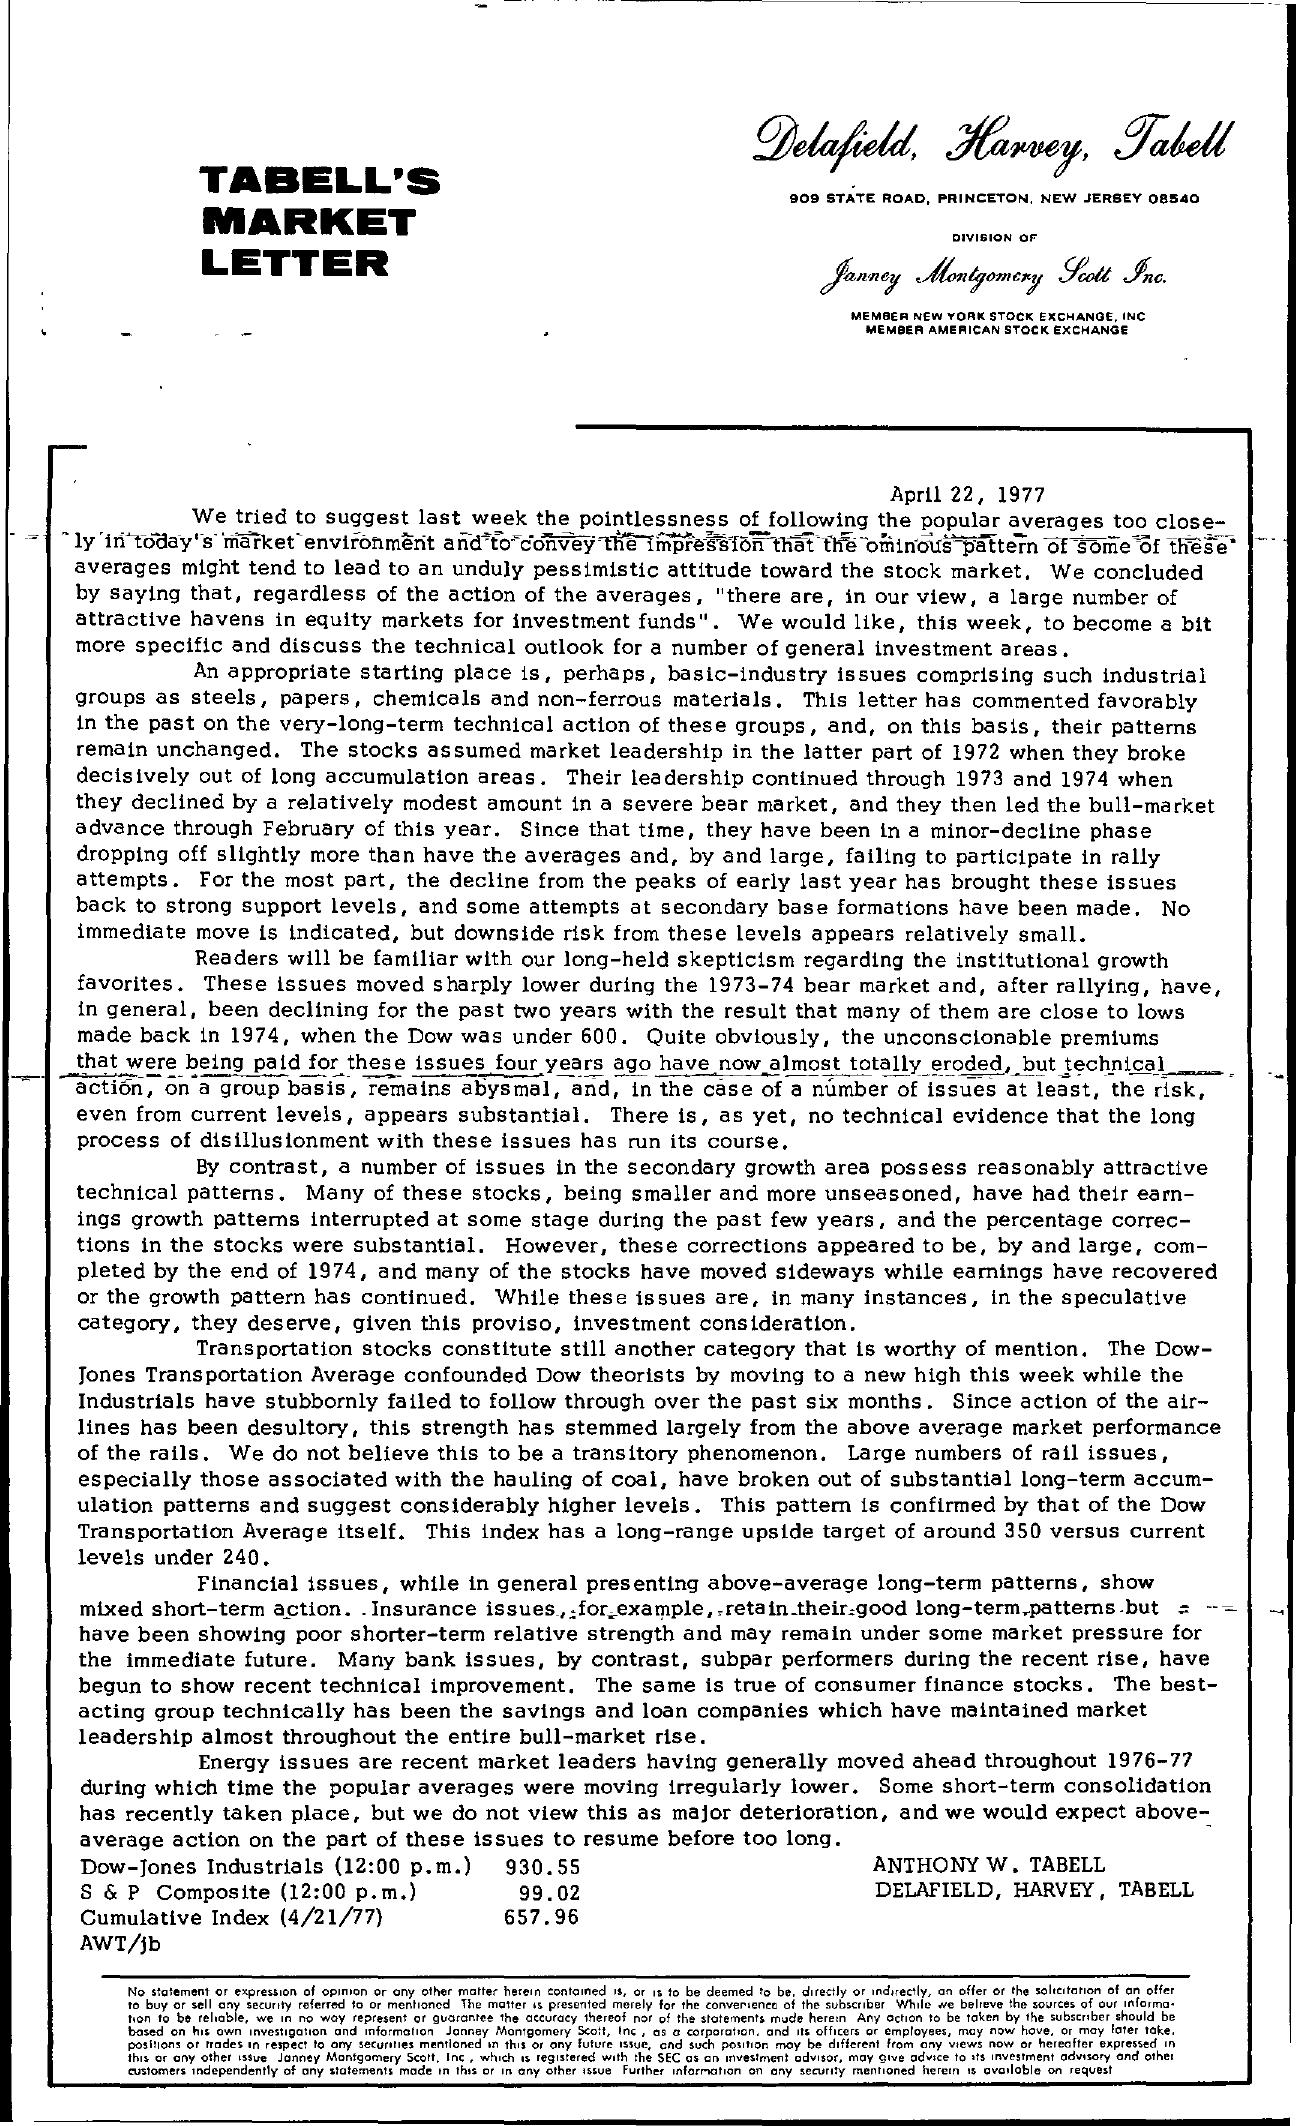 Tabell's Market Letter - April 22, 1977